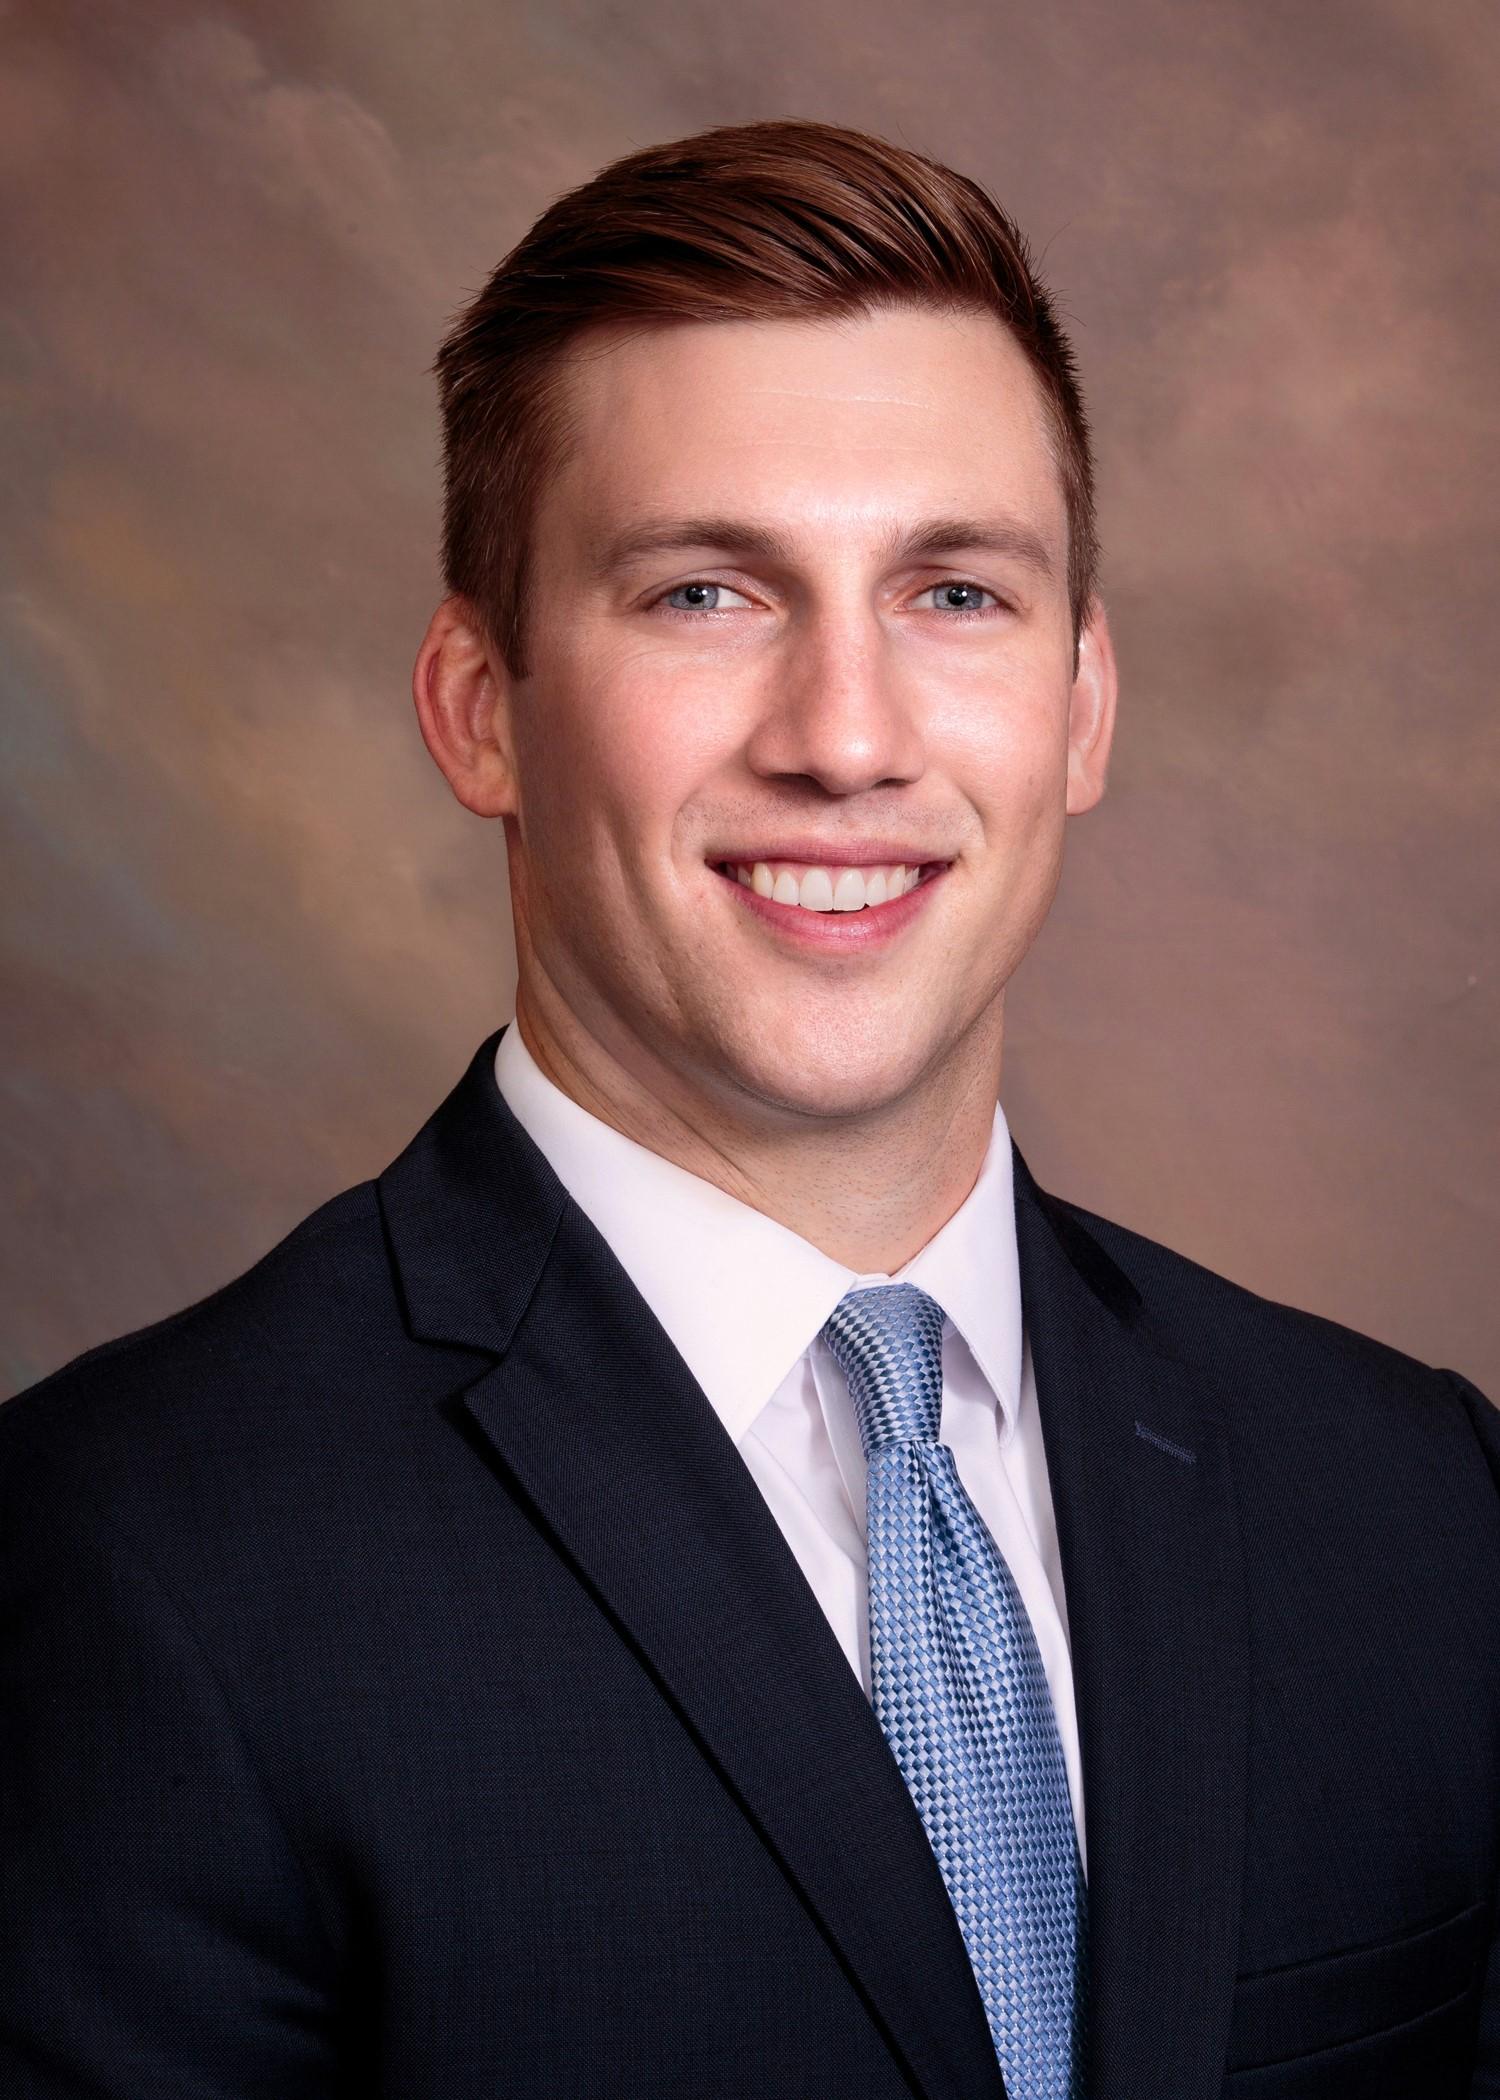 Brendan Burke - Community Relations Coordinator